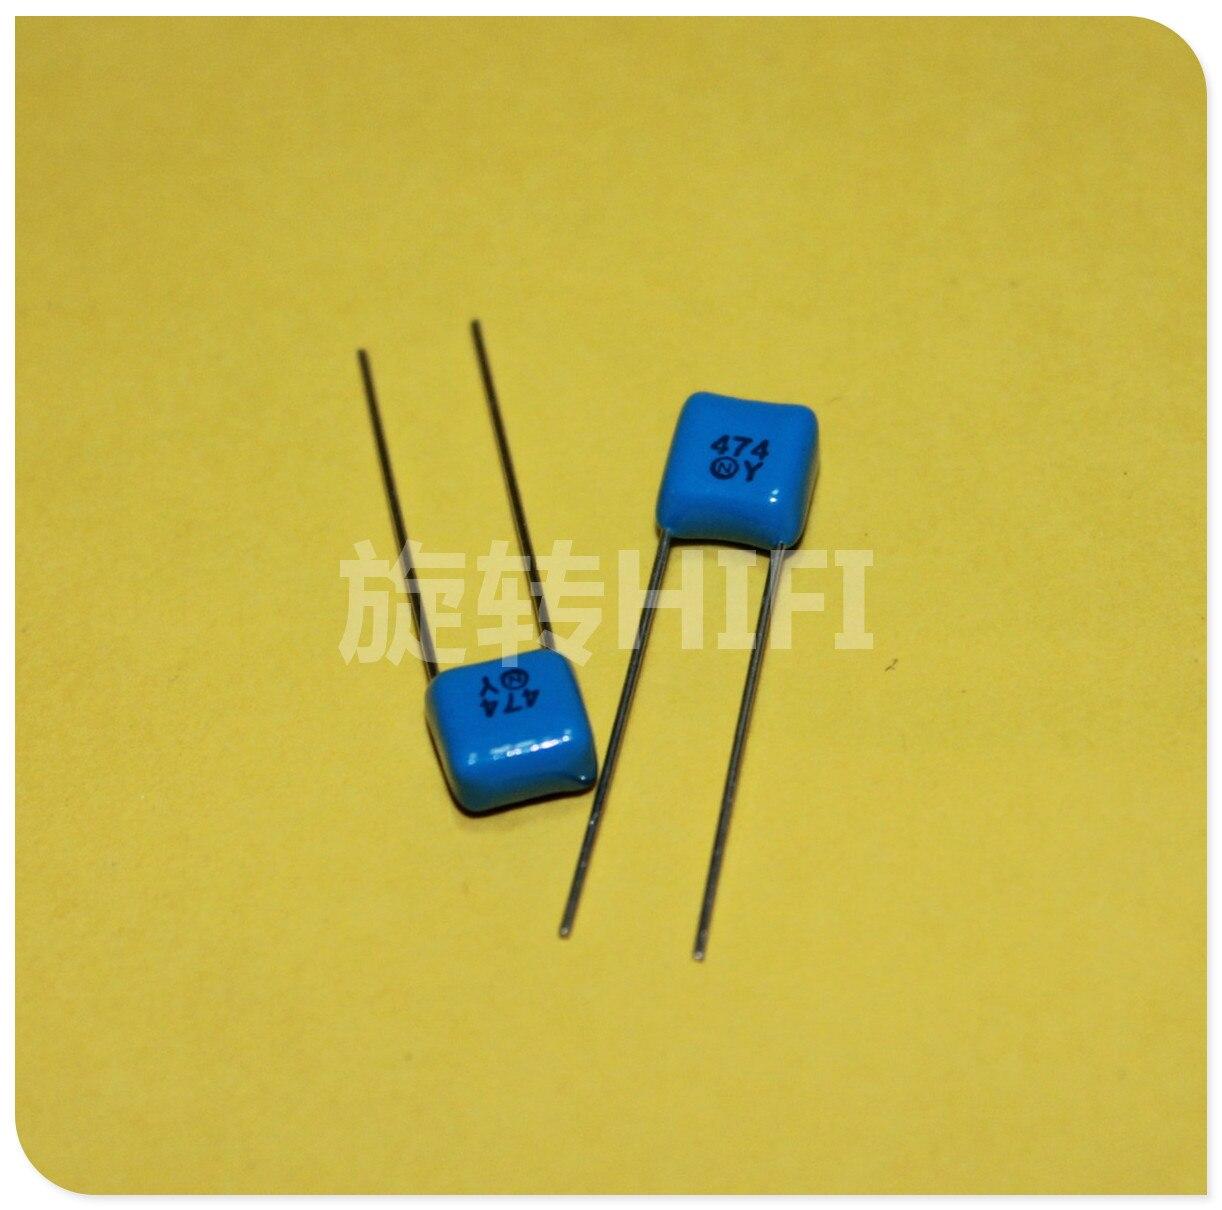 20PCS Japan NISSEI CBB Capacitor 0.47UF 63V 470NF P5mm NIS 0.47uF/63V 474/63V 474 Metallized Polyester Film Capacitor